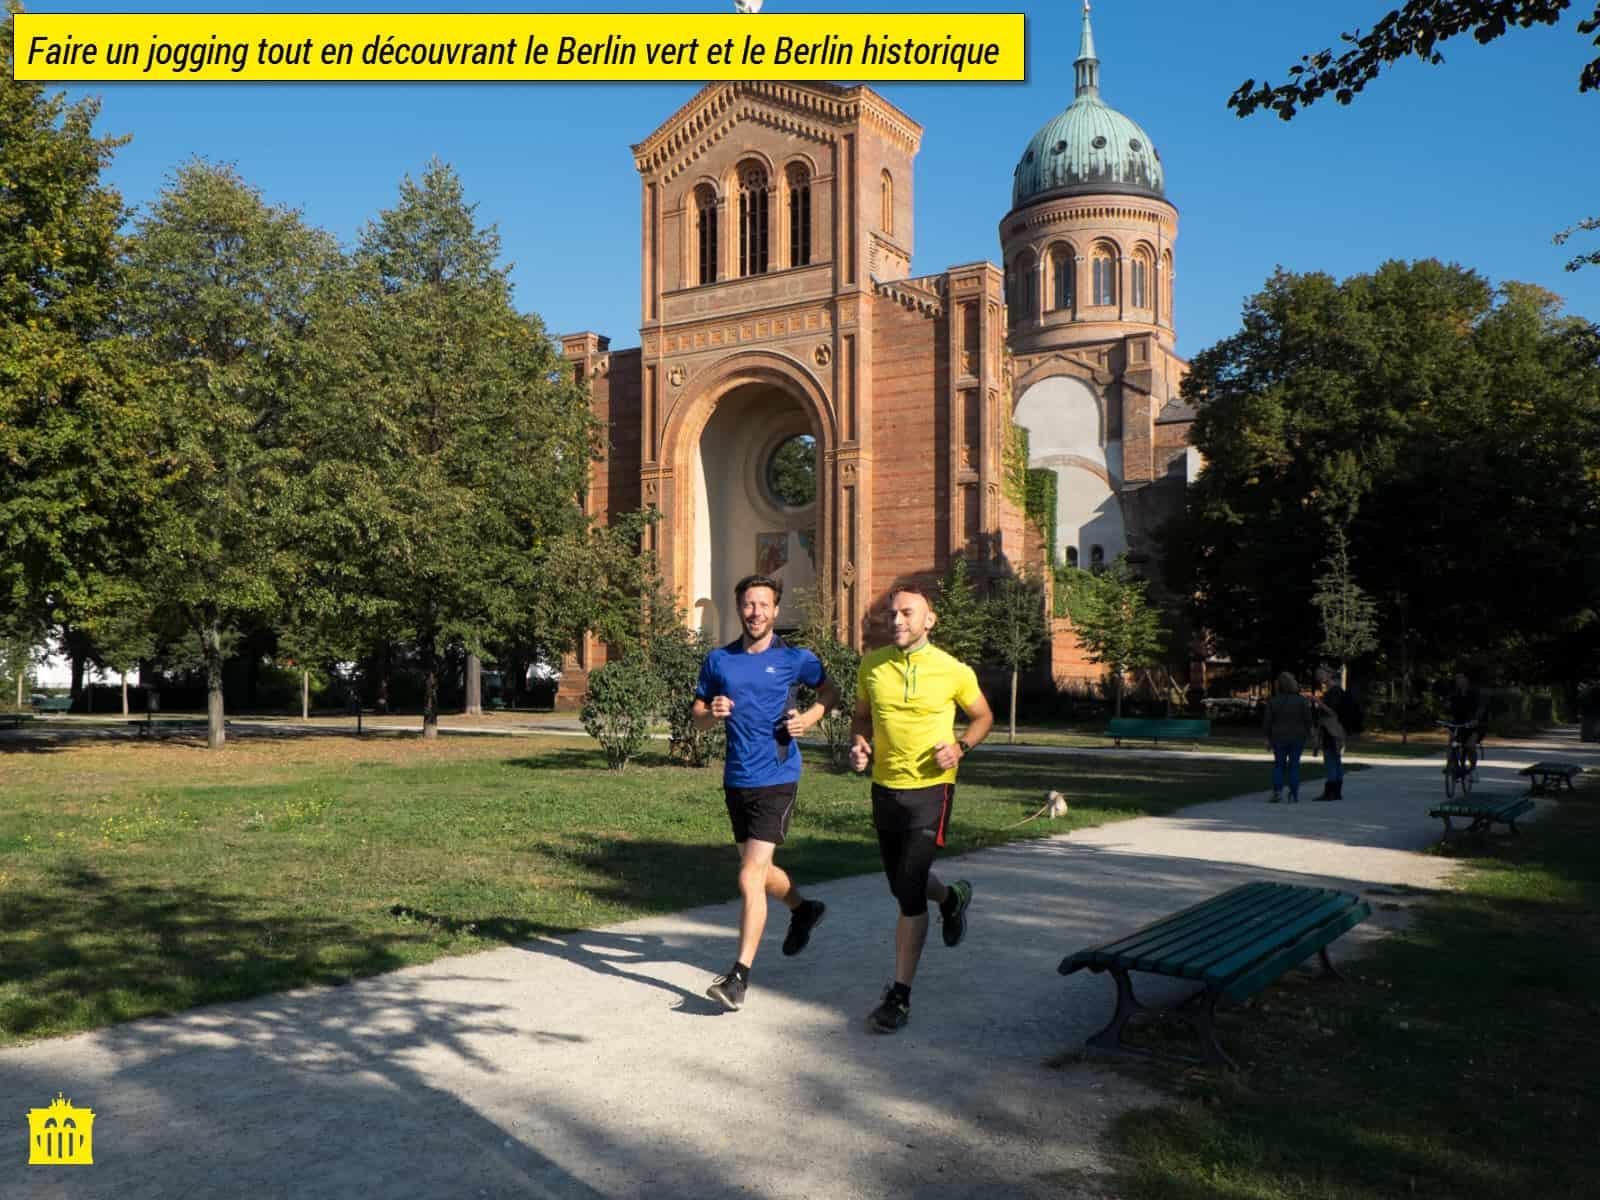 visite guidée jogging berlin